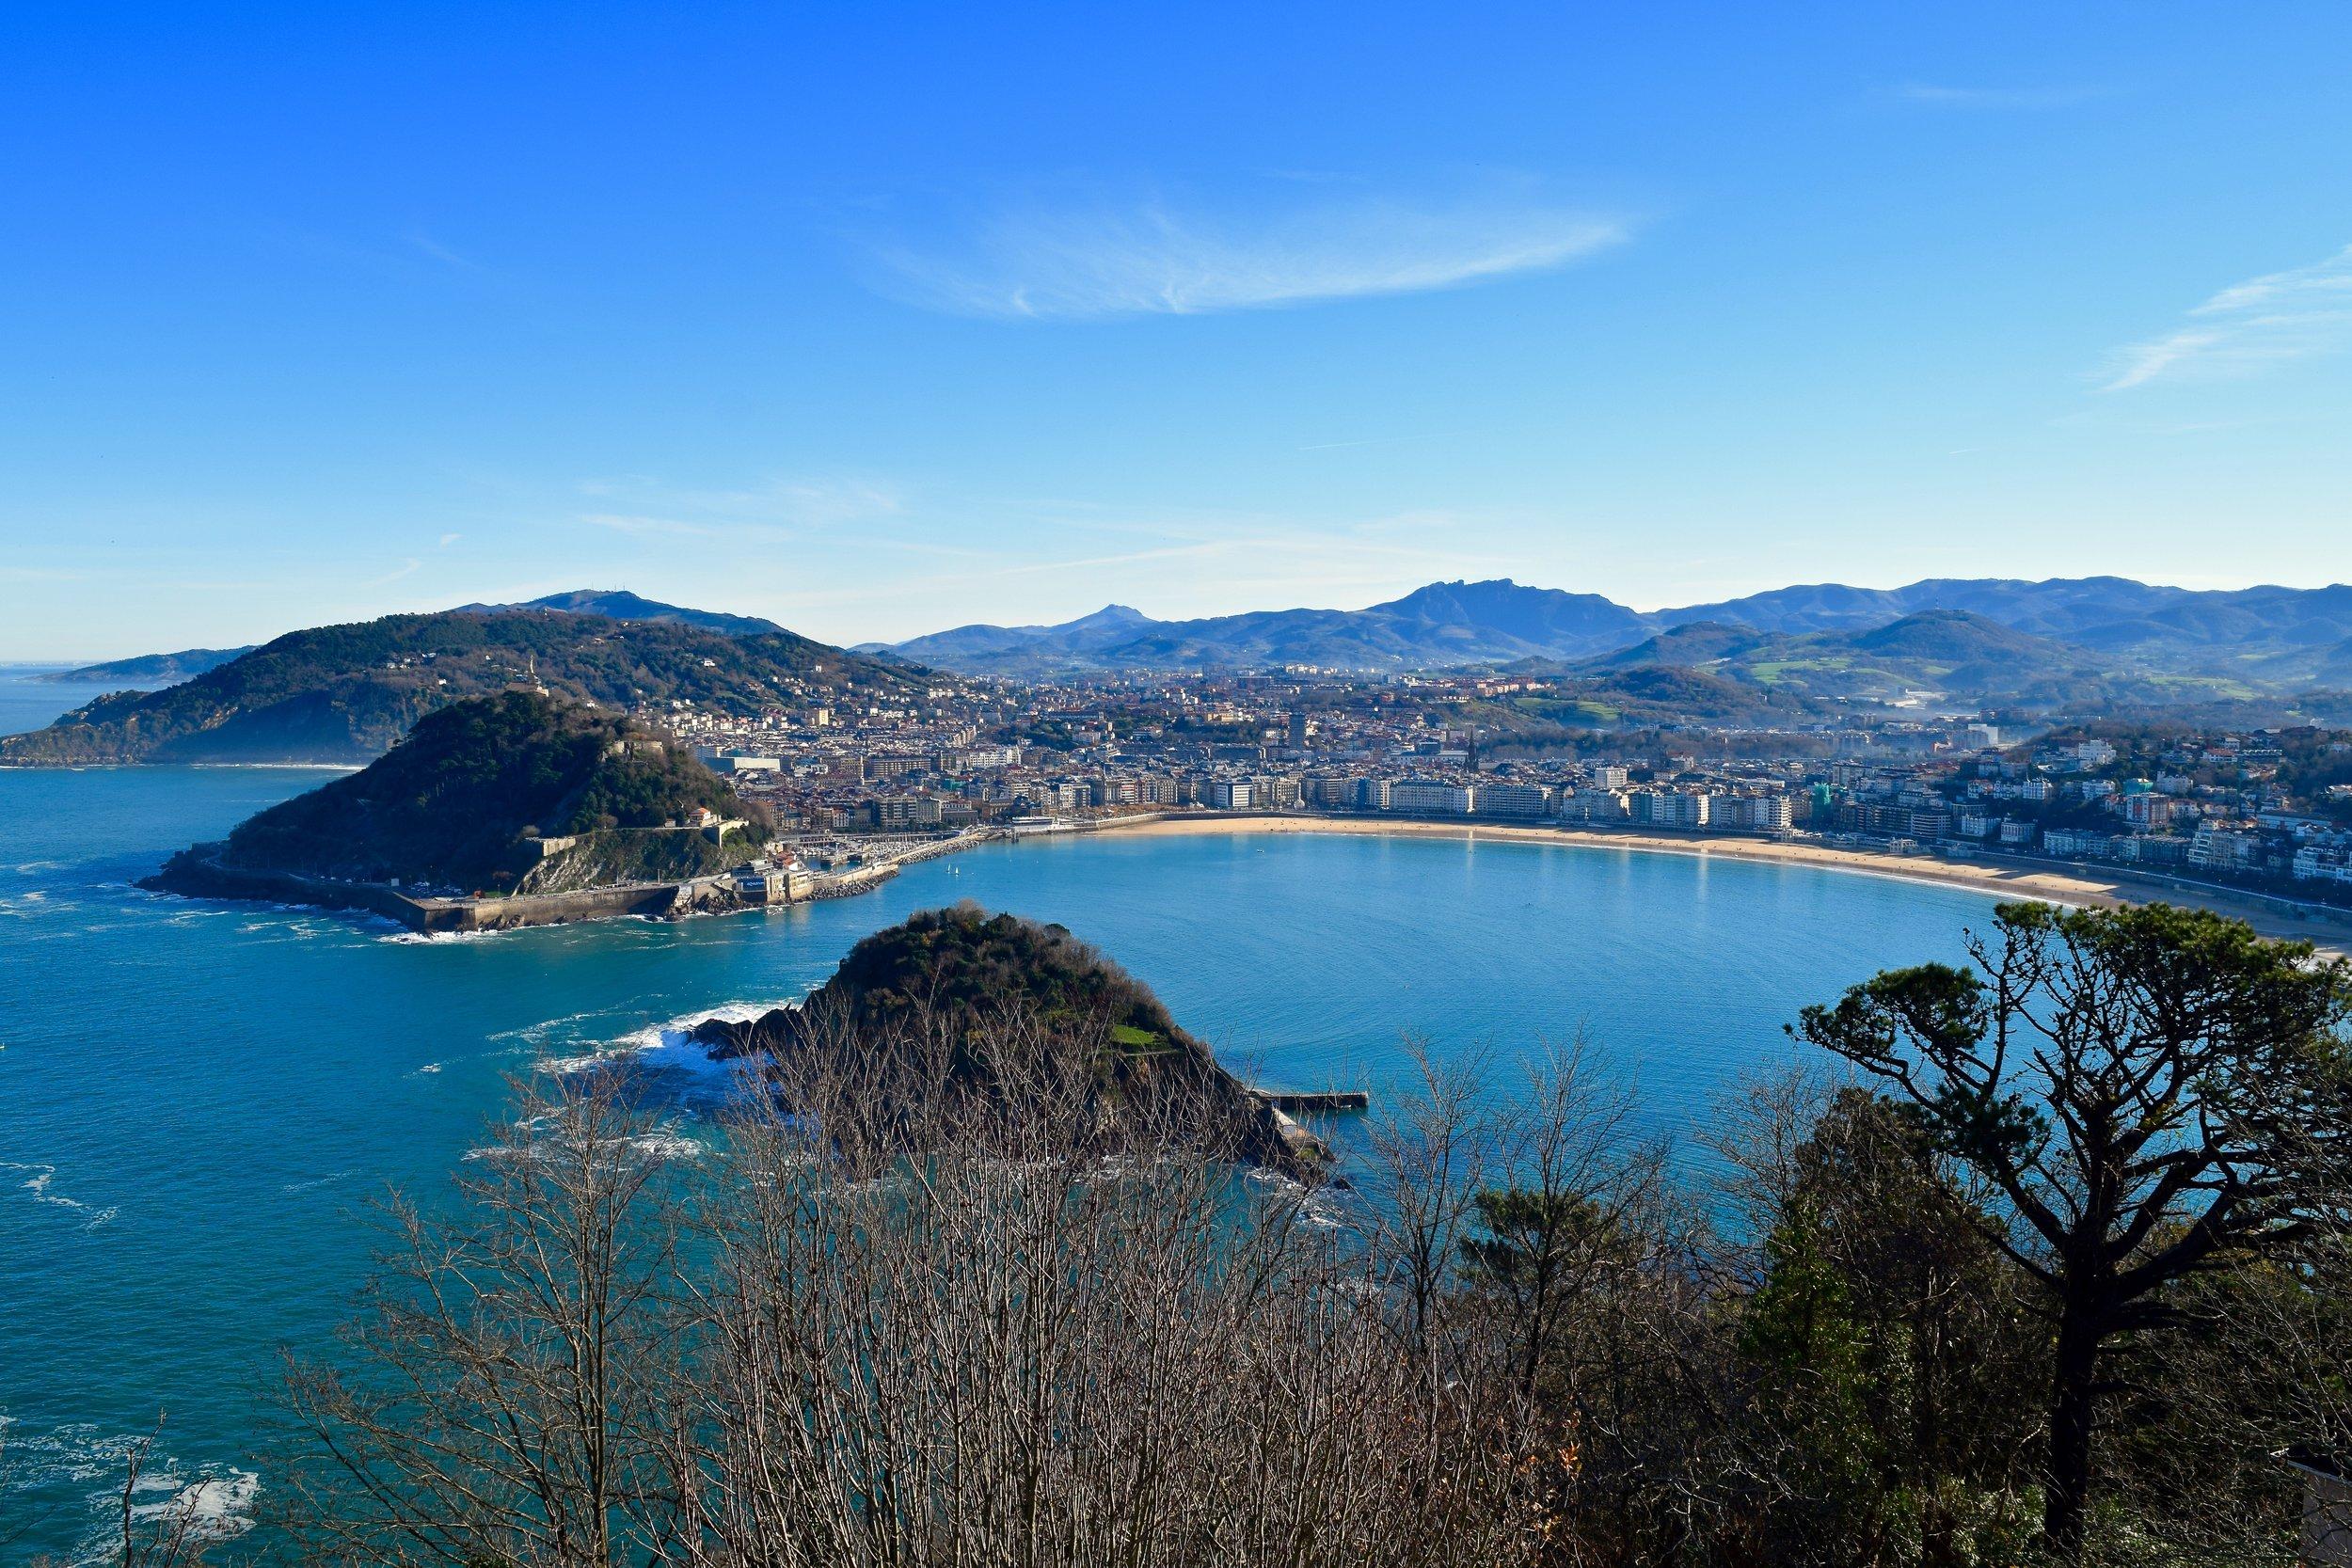 View of San Sebastián from Mount Igueldo